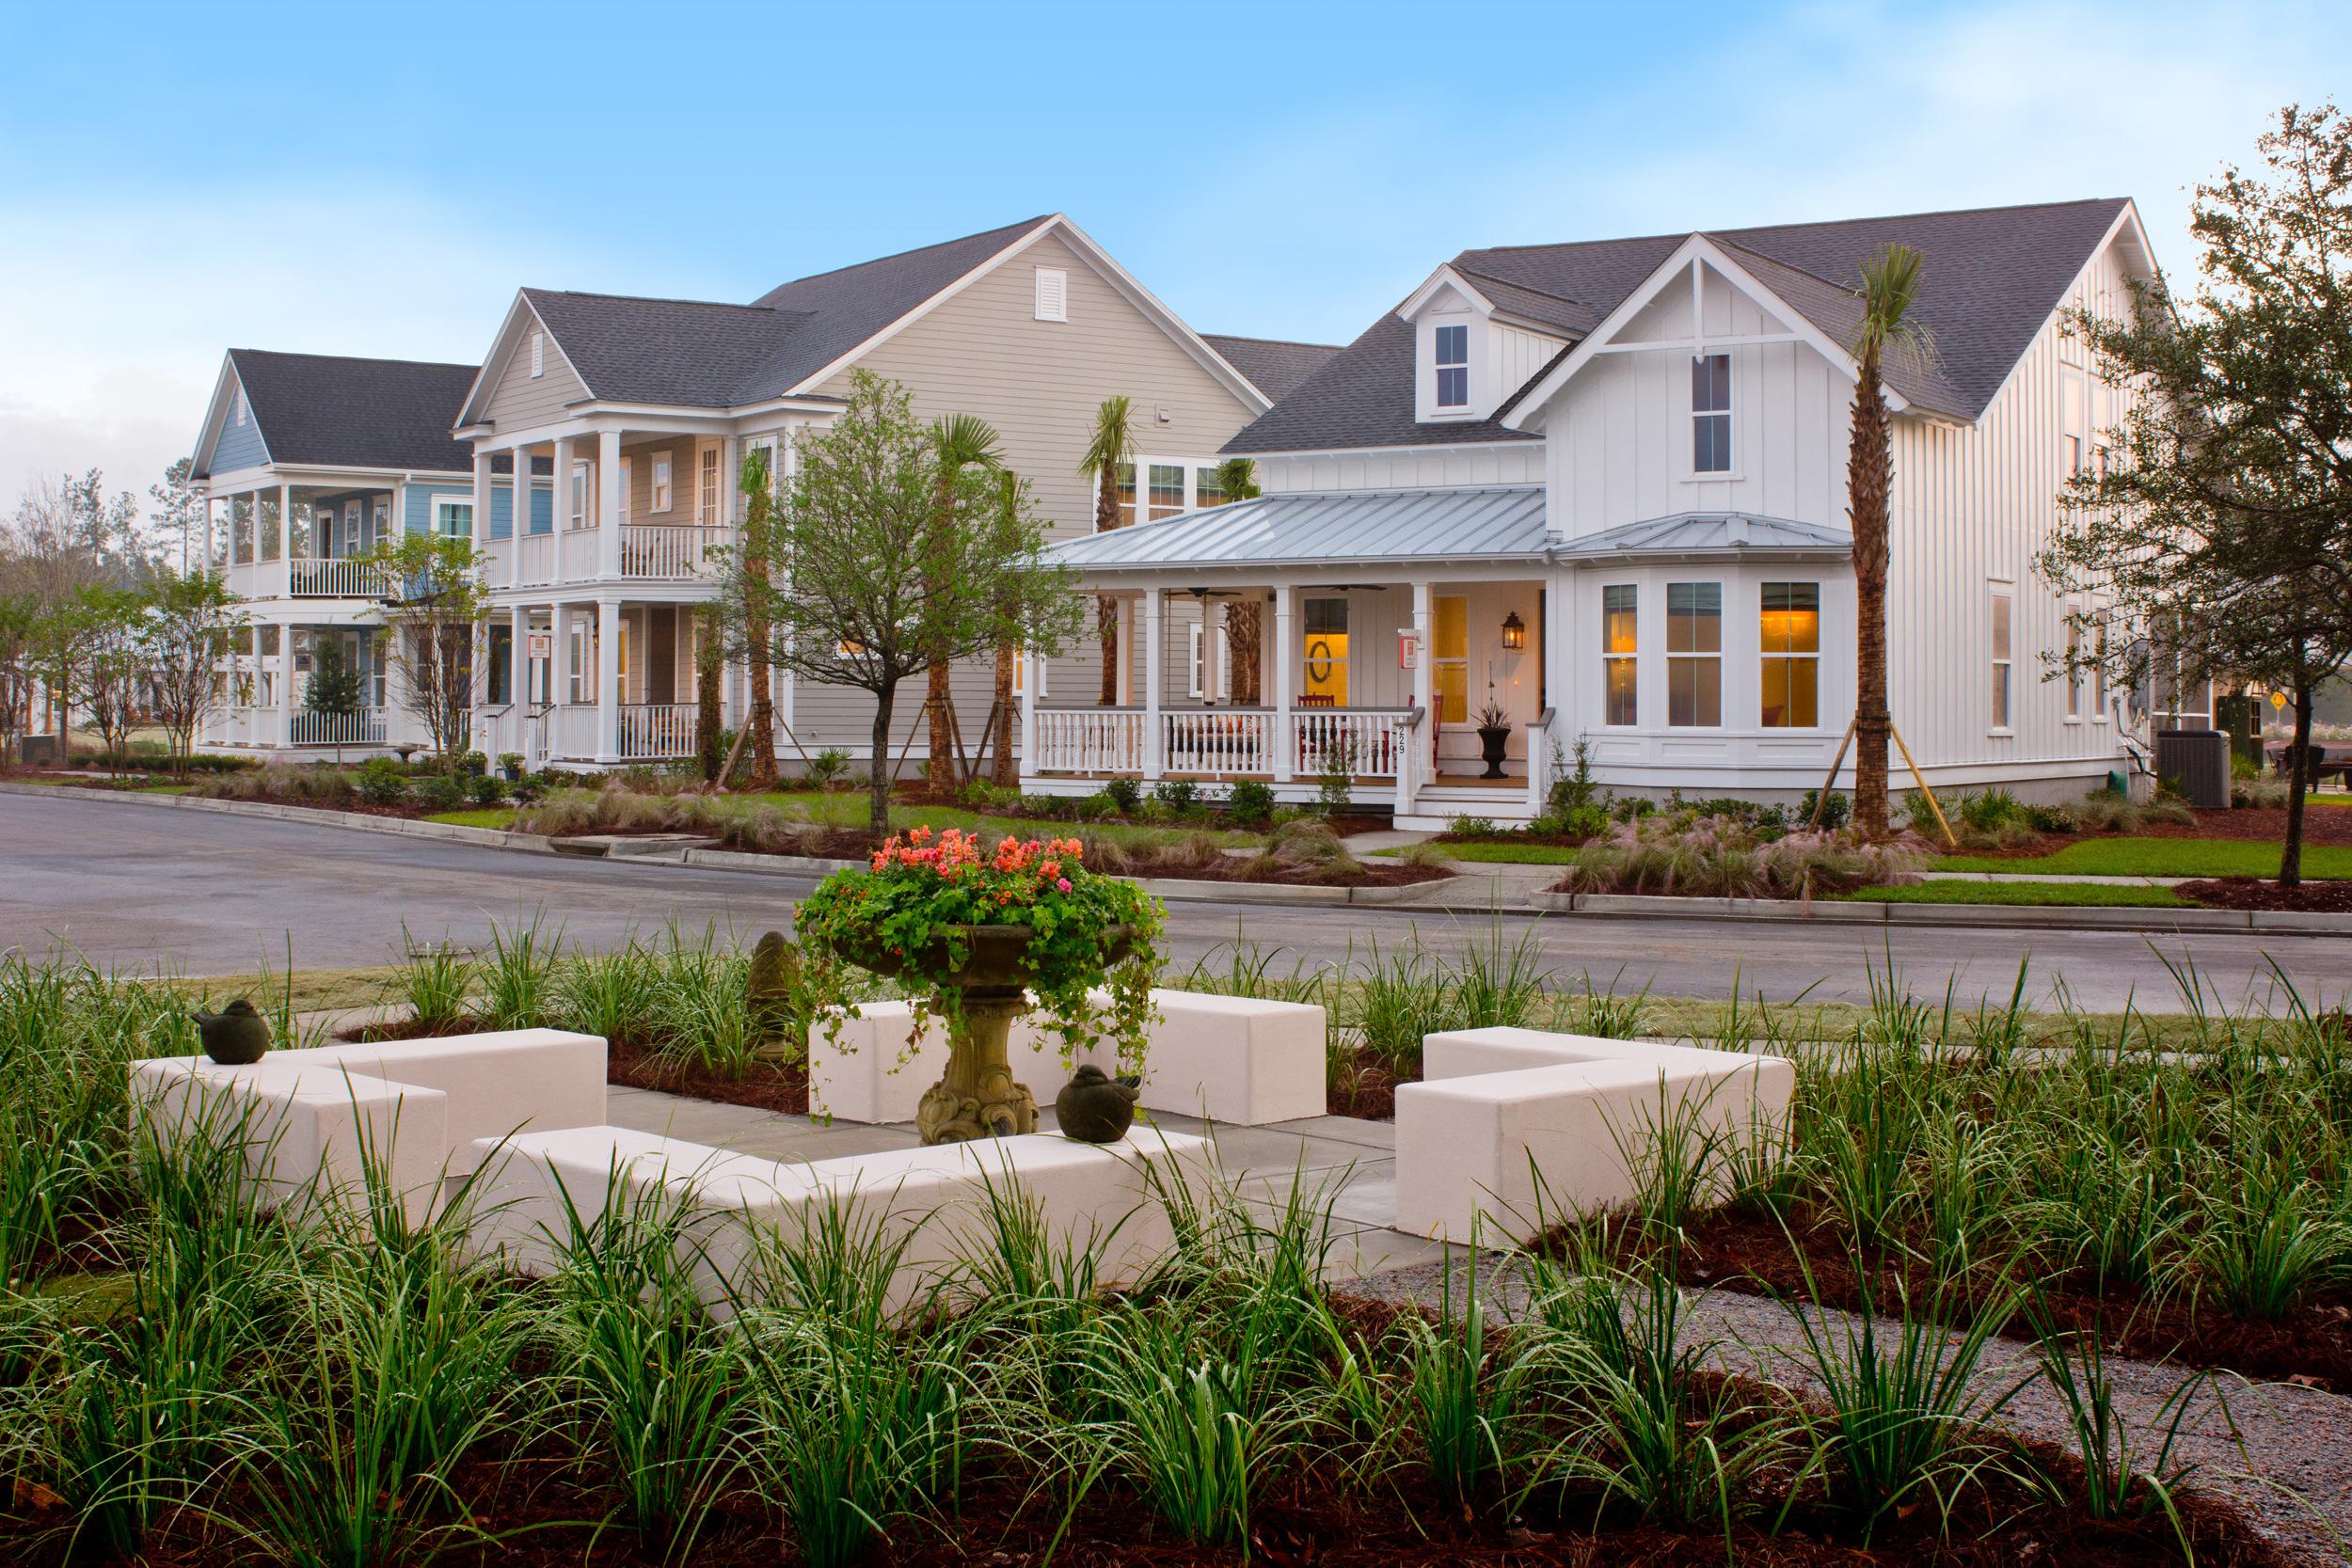 100 model home designer job description new for Home design job description